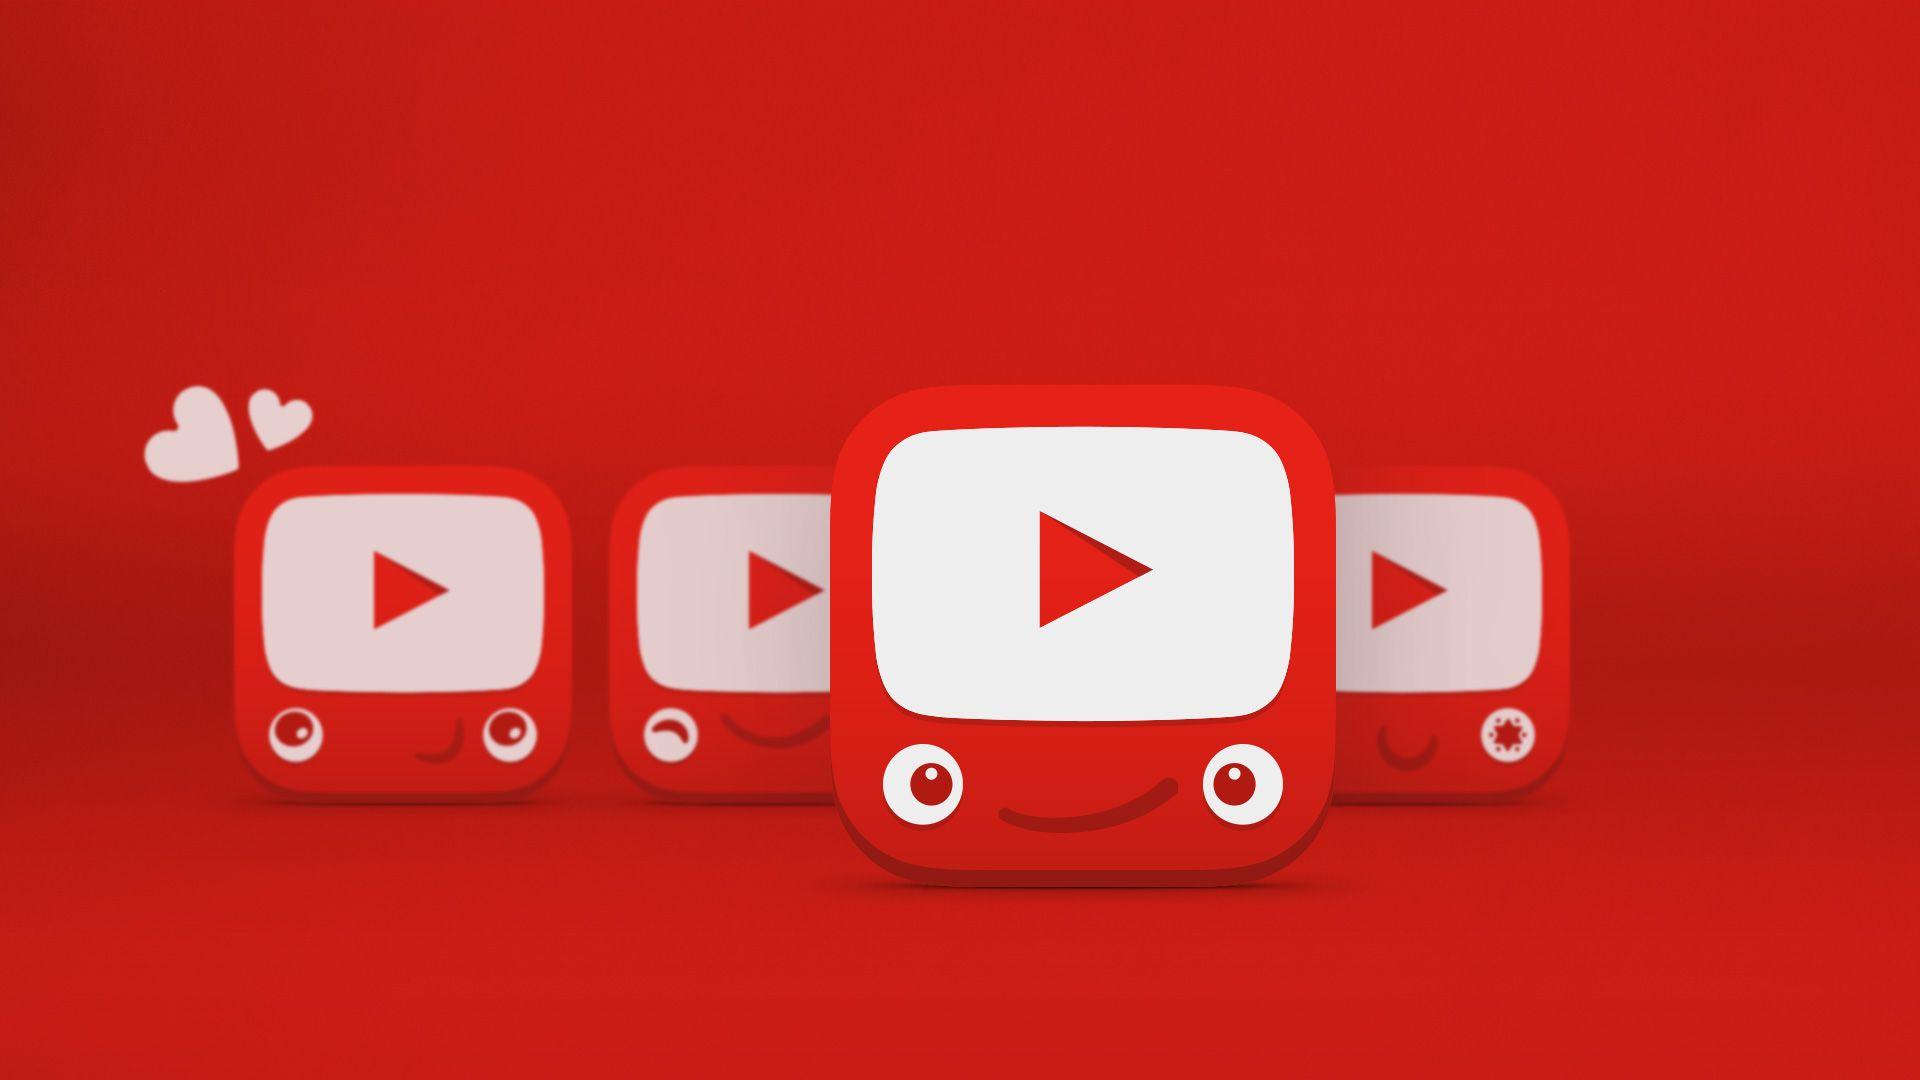 youtube wallpaper download